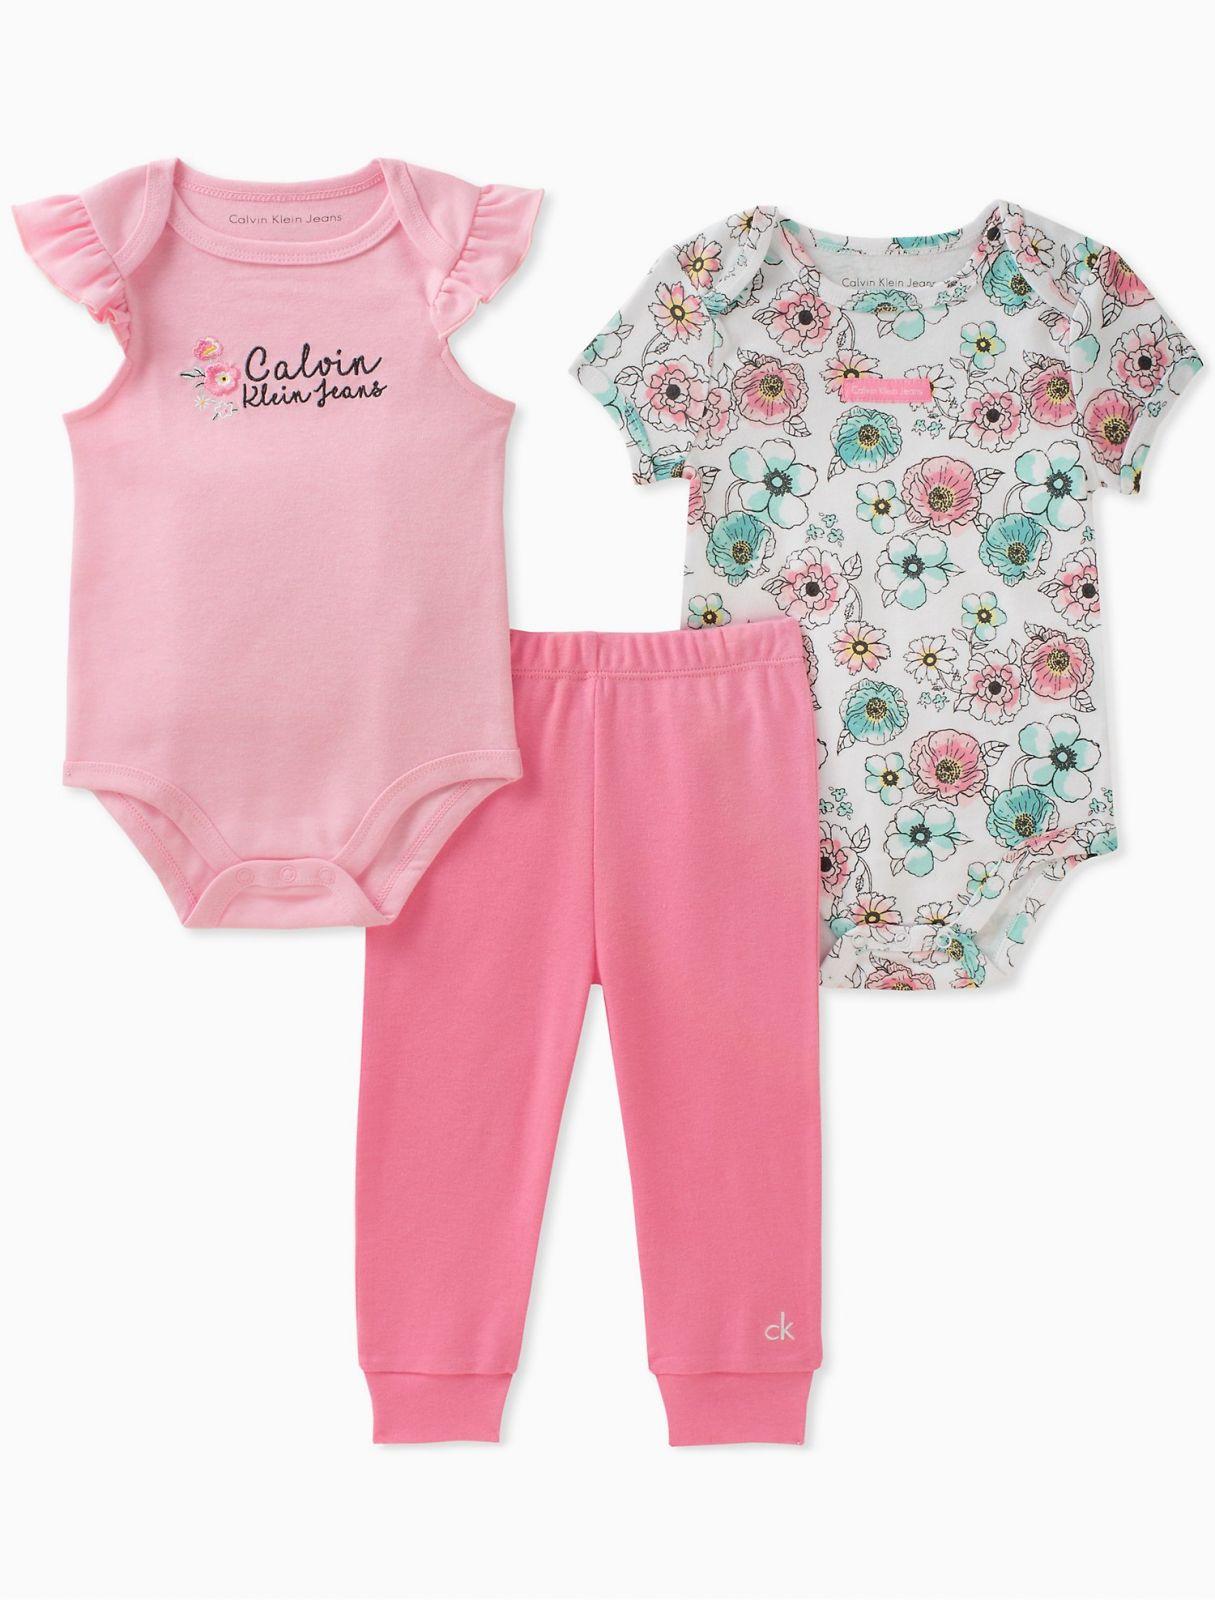 Calvin Klein luxusní oblečení 2-pack floral onesies + leggings